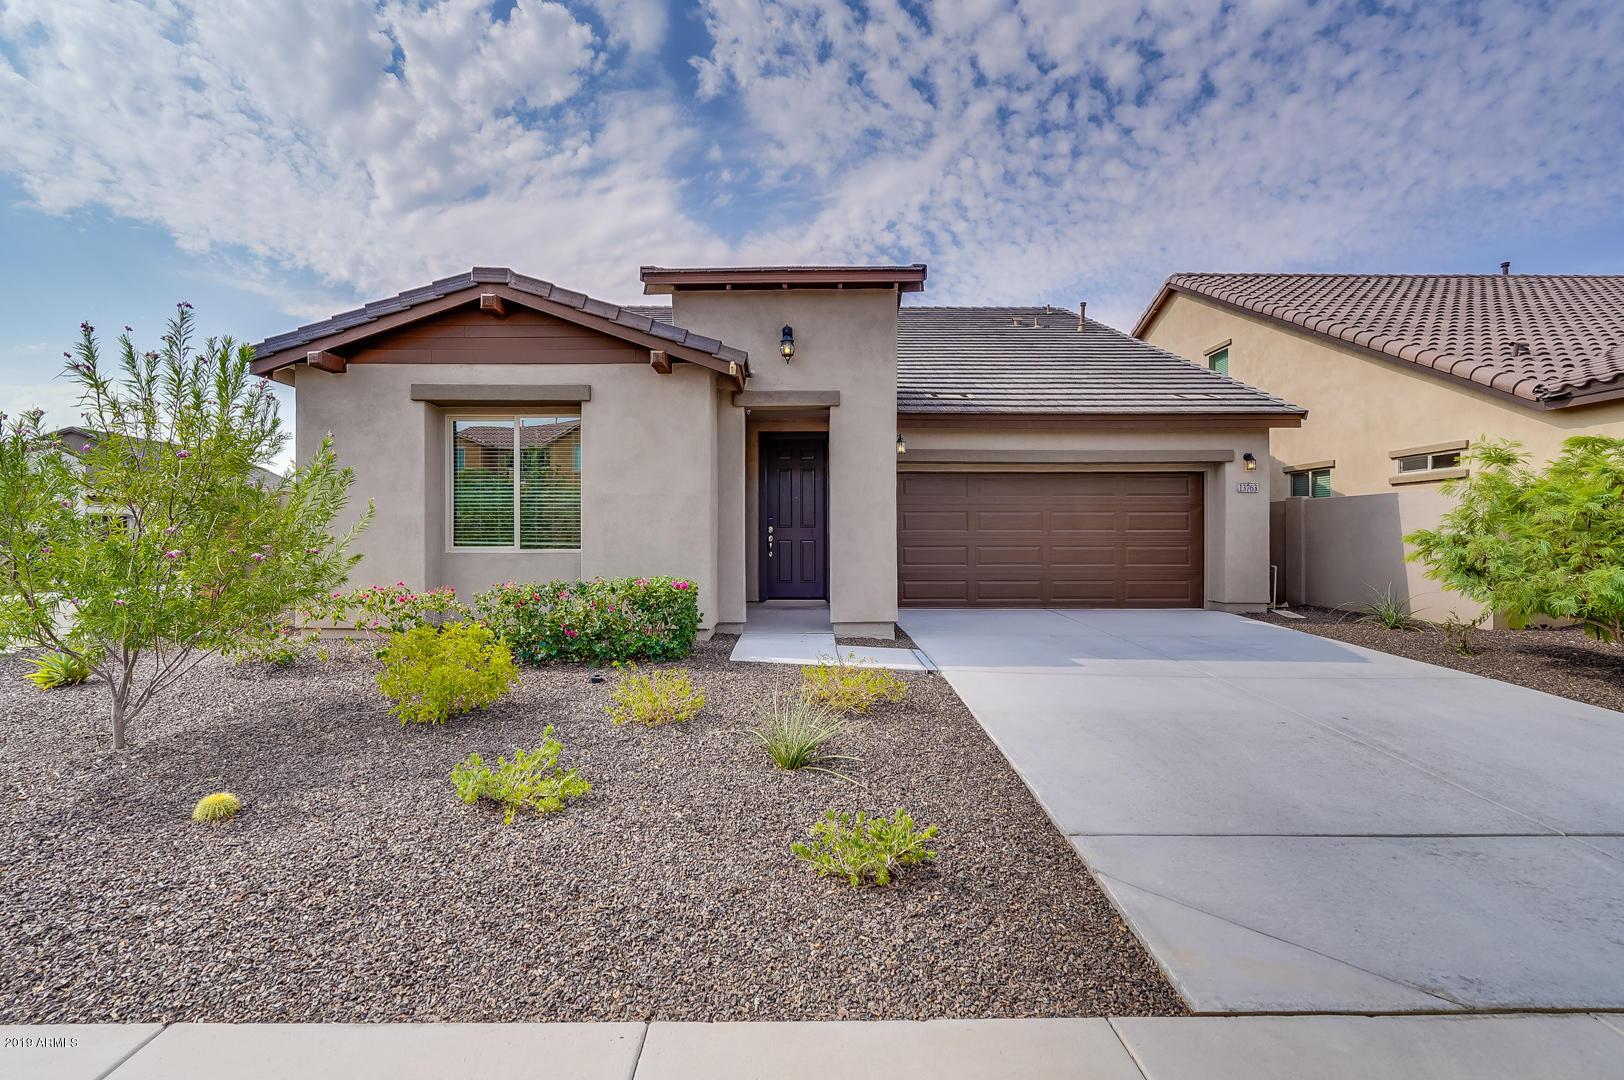 Photo of 13763 W GILIA Way, Peoria, AZ 85383